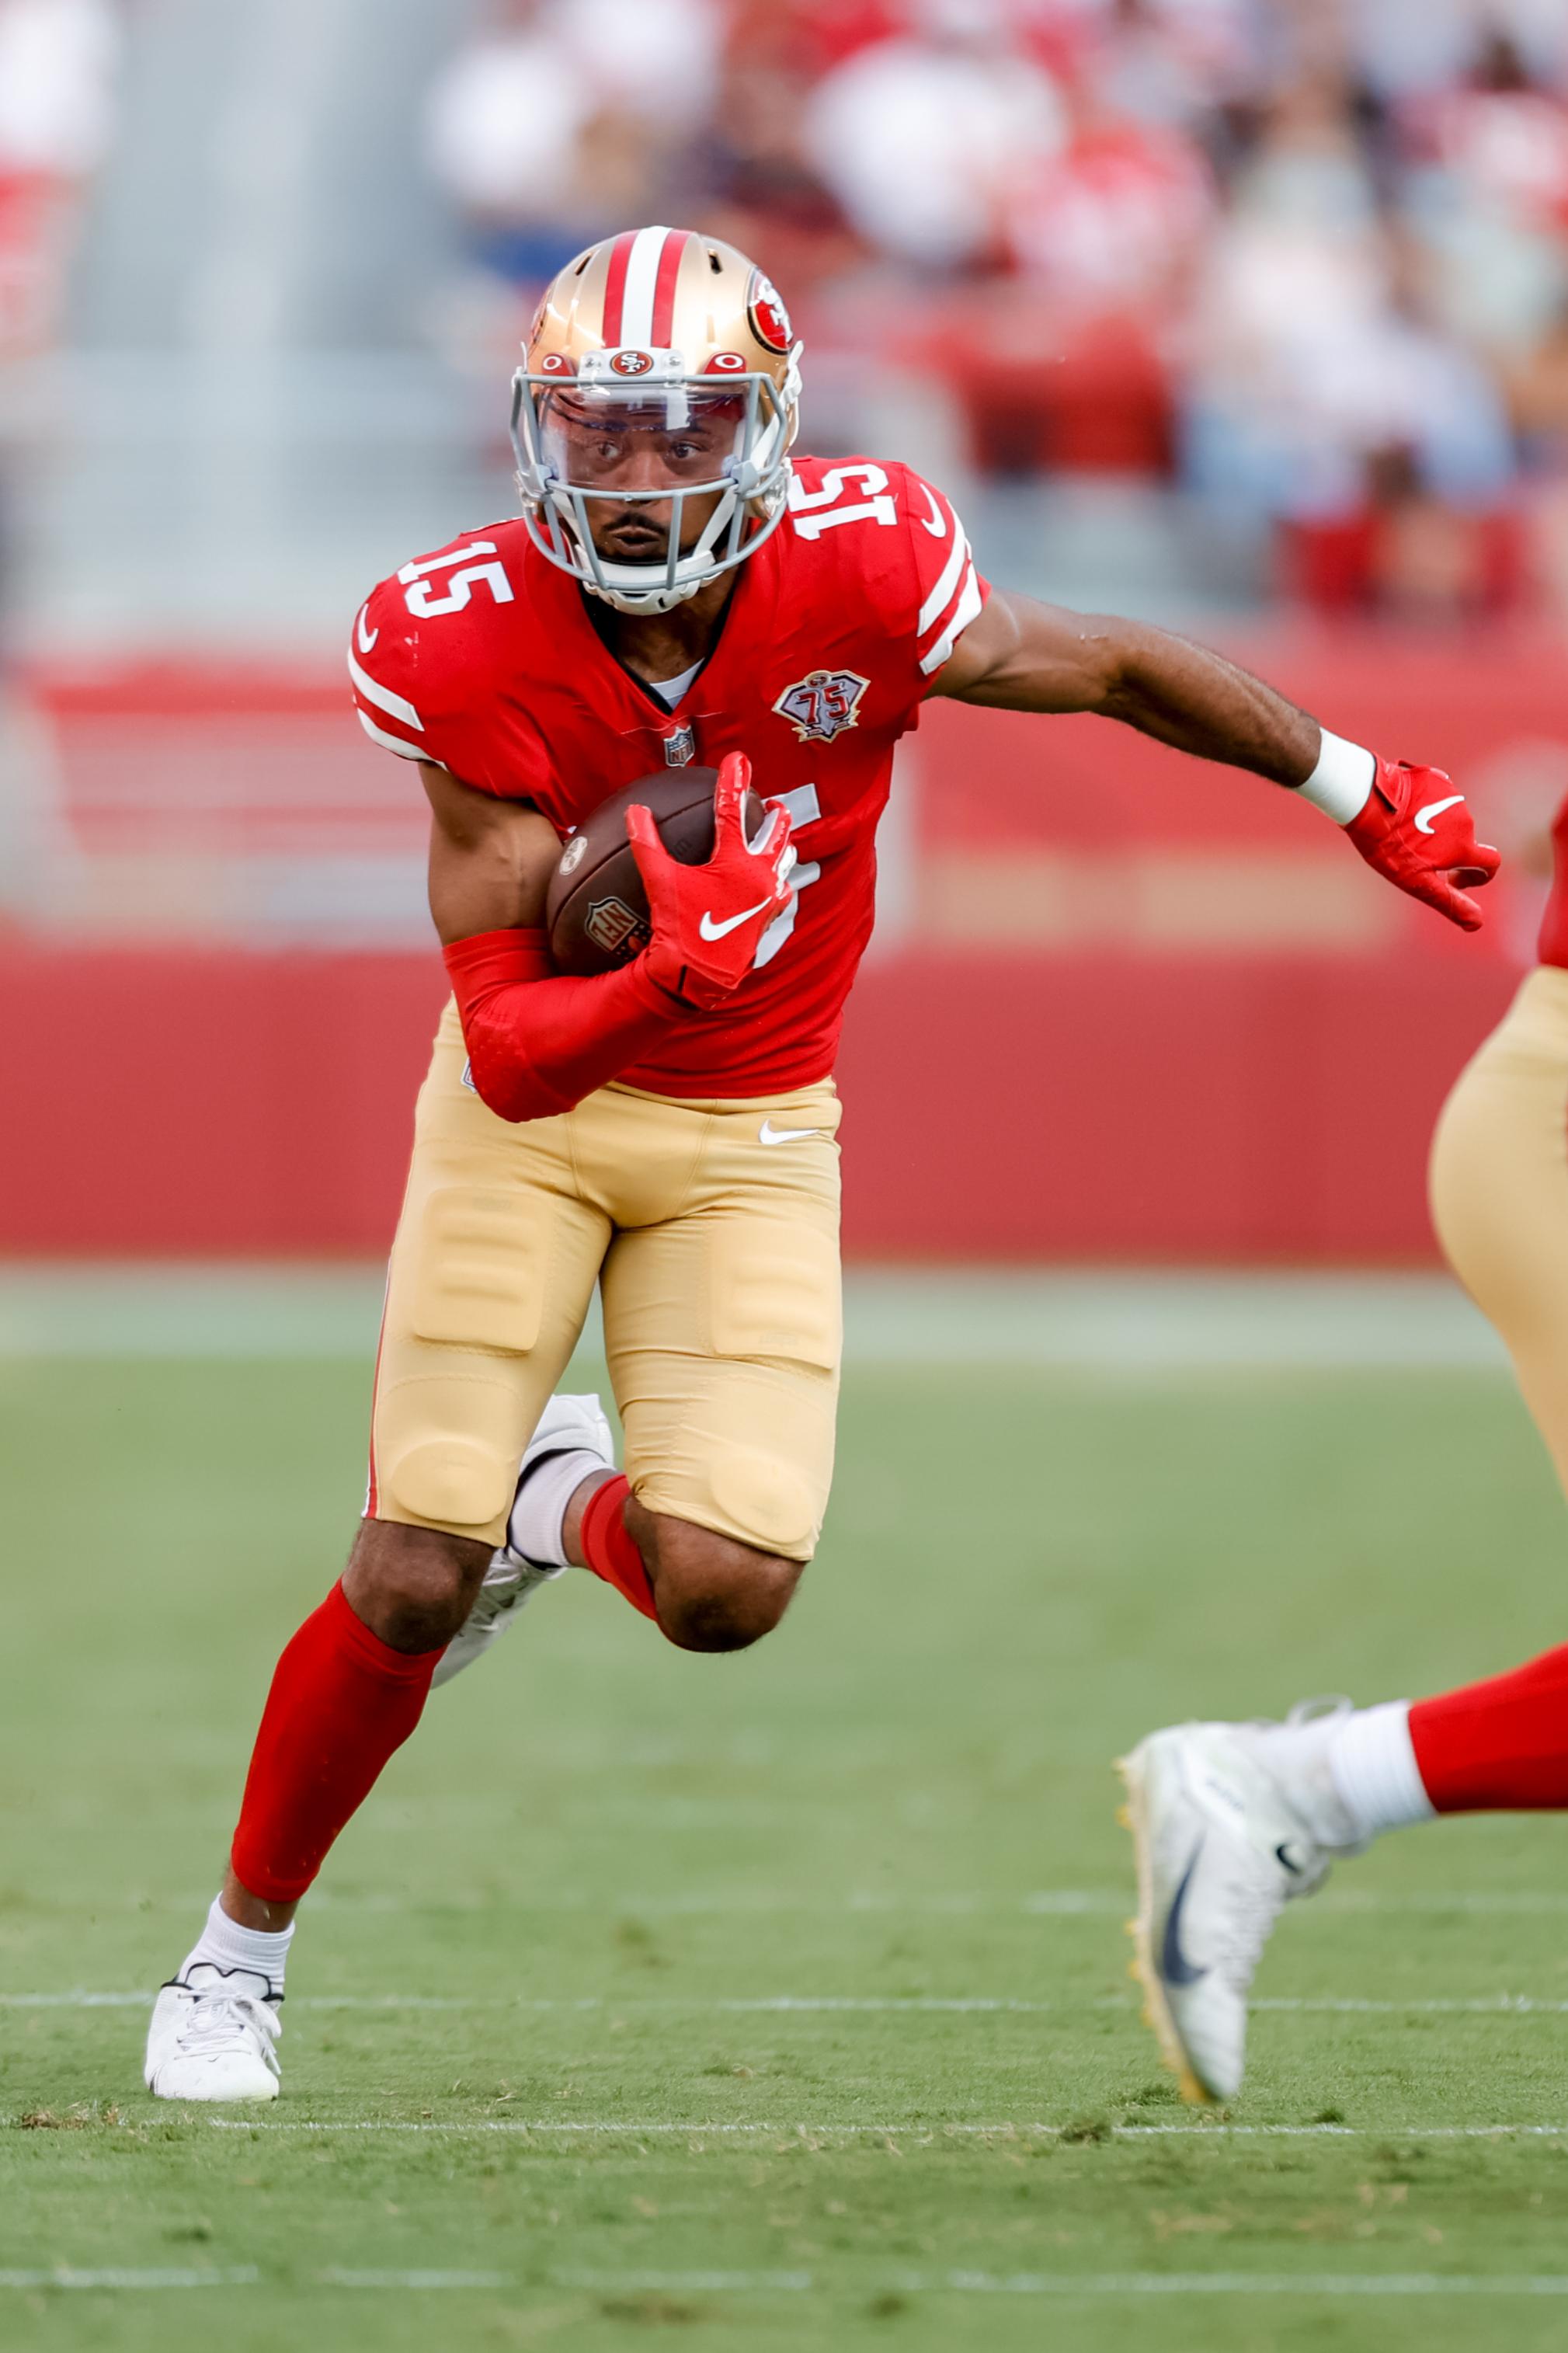 NFL: AUG 14 Preseason - Chiefs at 49ers